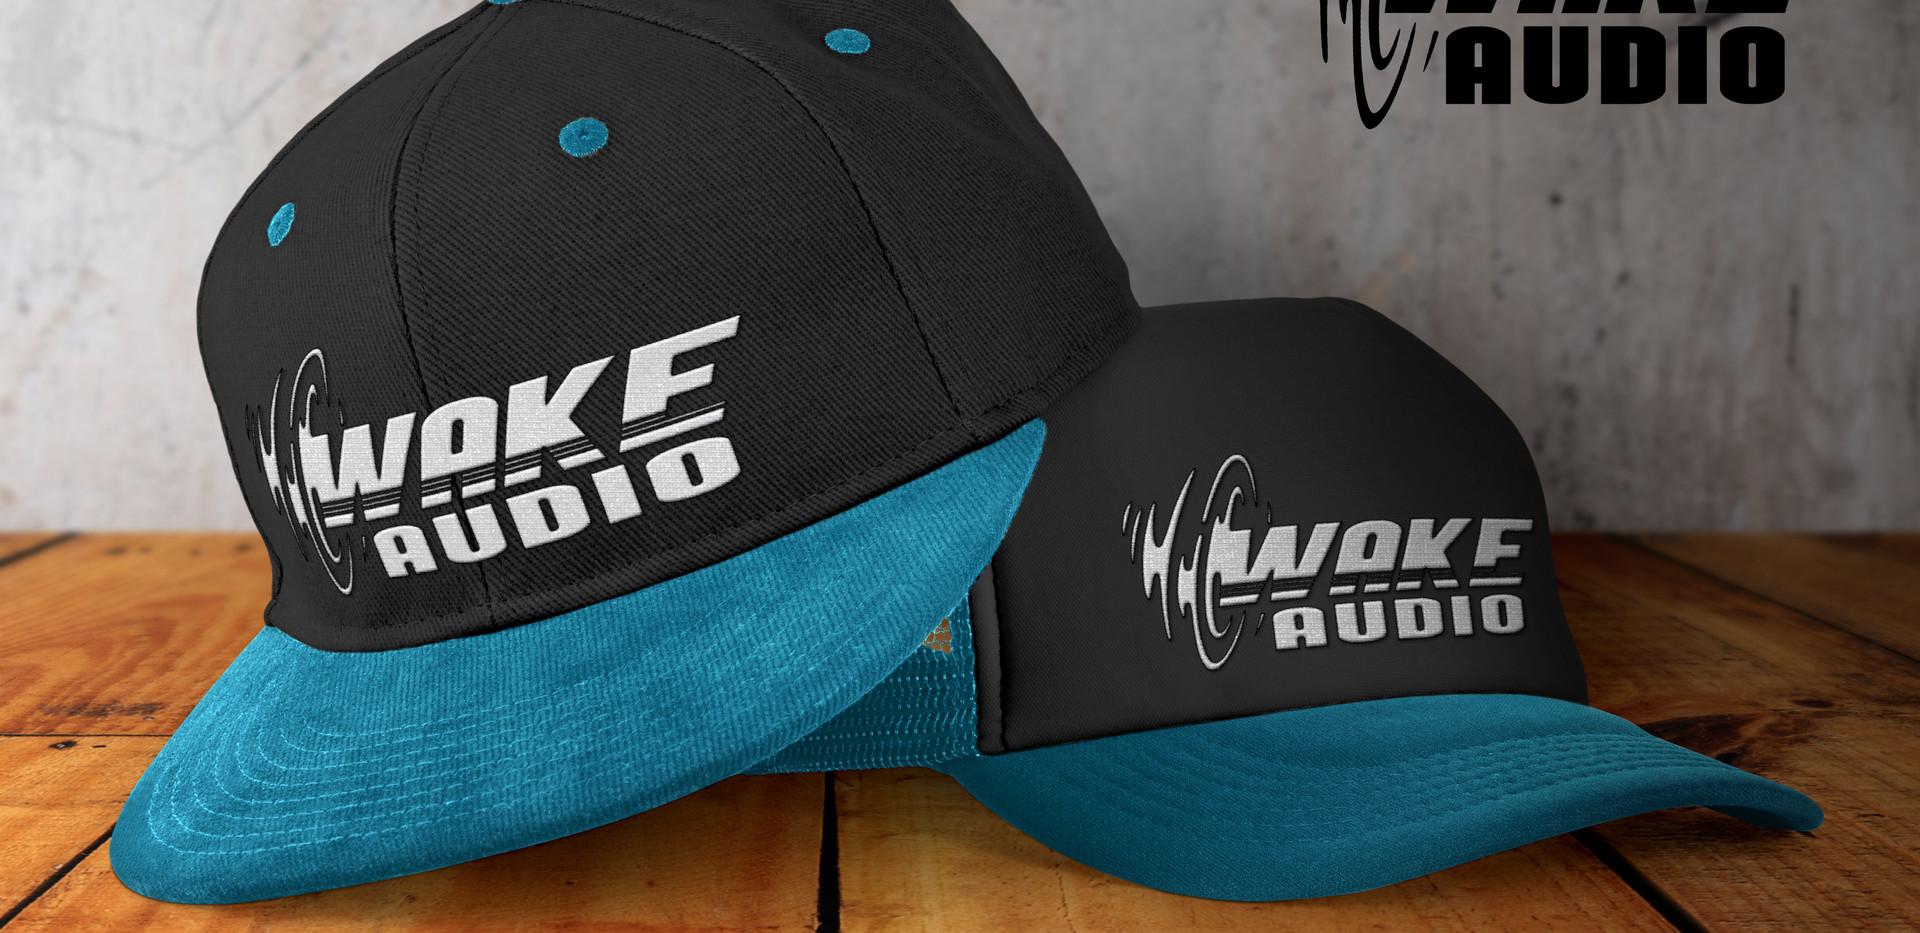 Wake Audio Blue & Black Hat